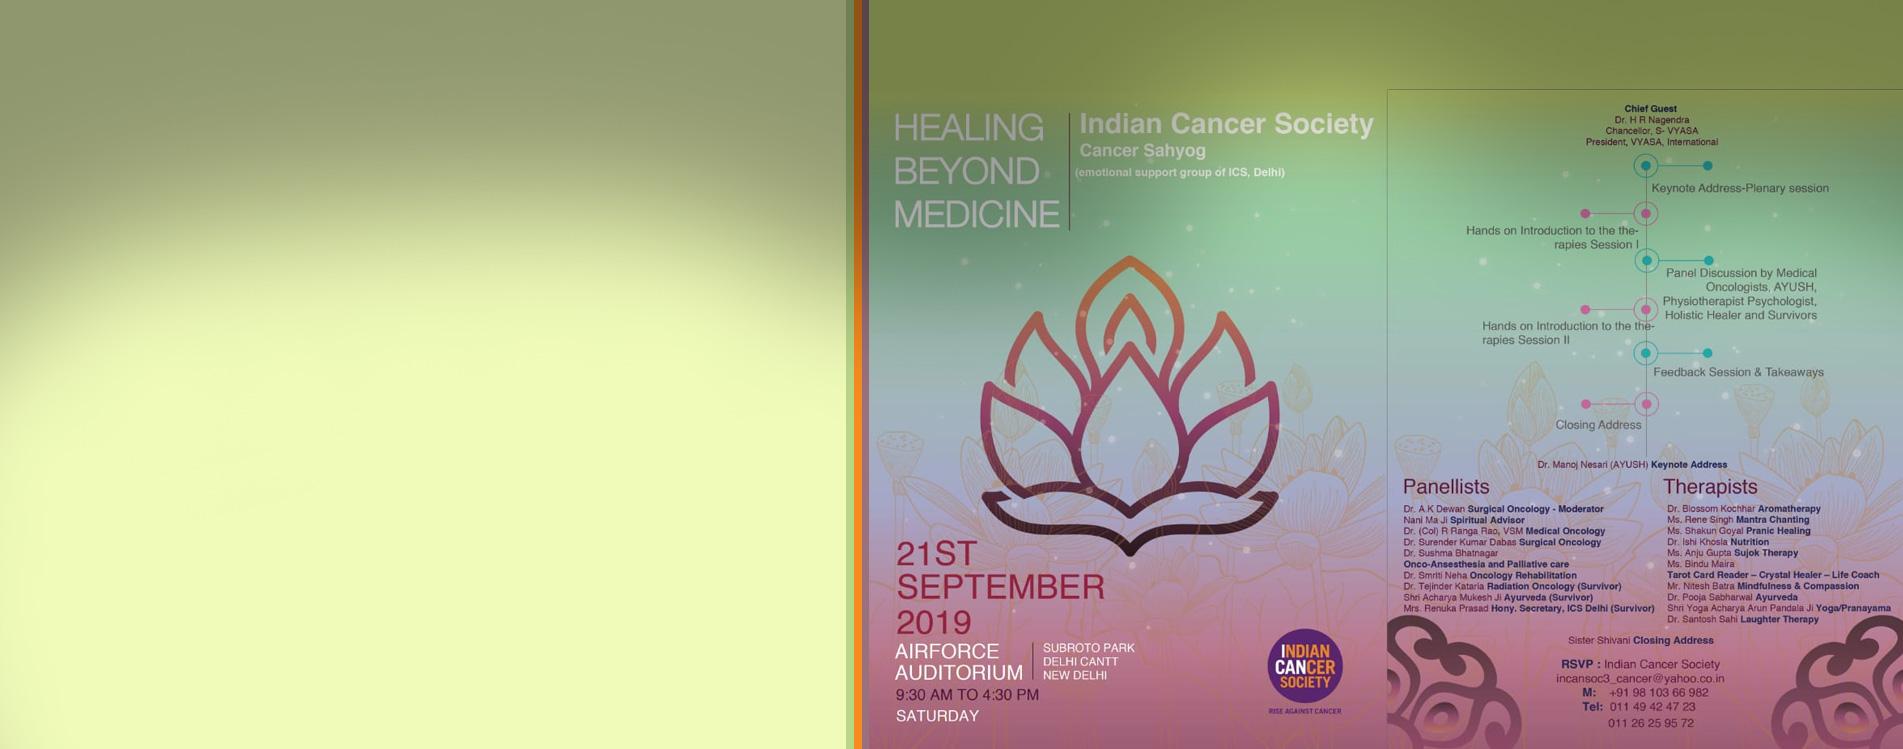 Healing-Beyond-Medicine